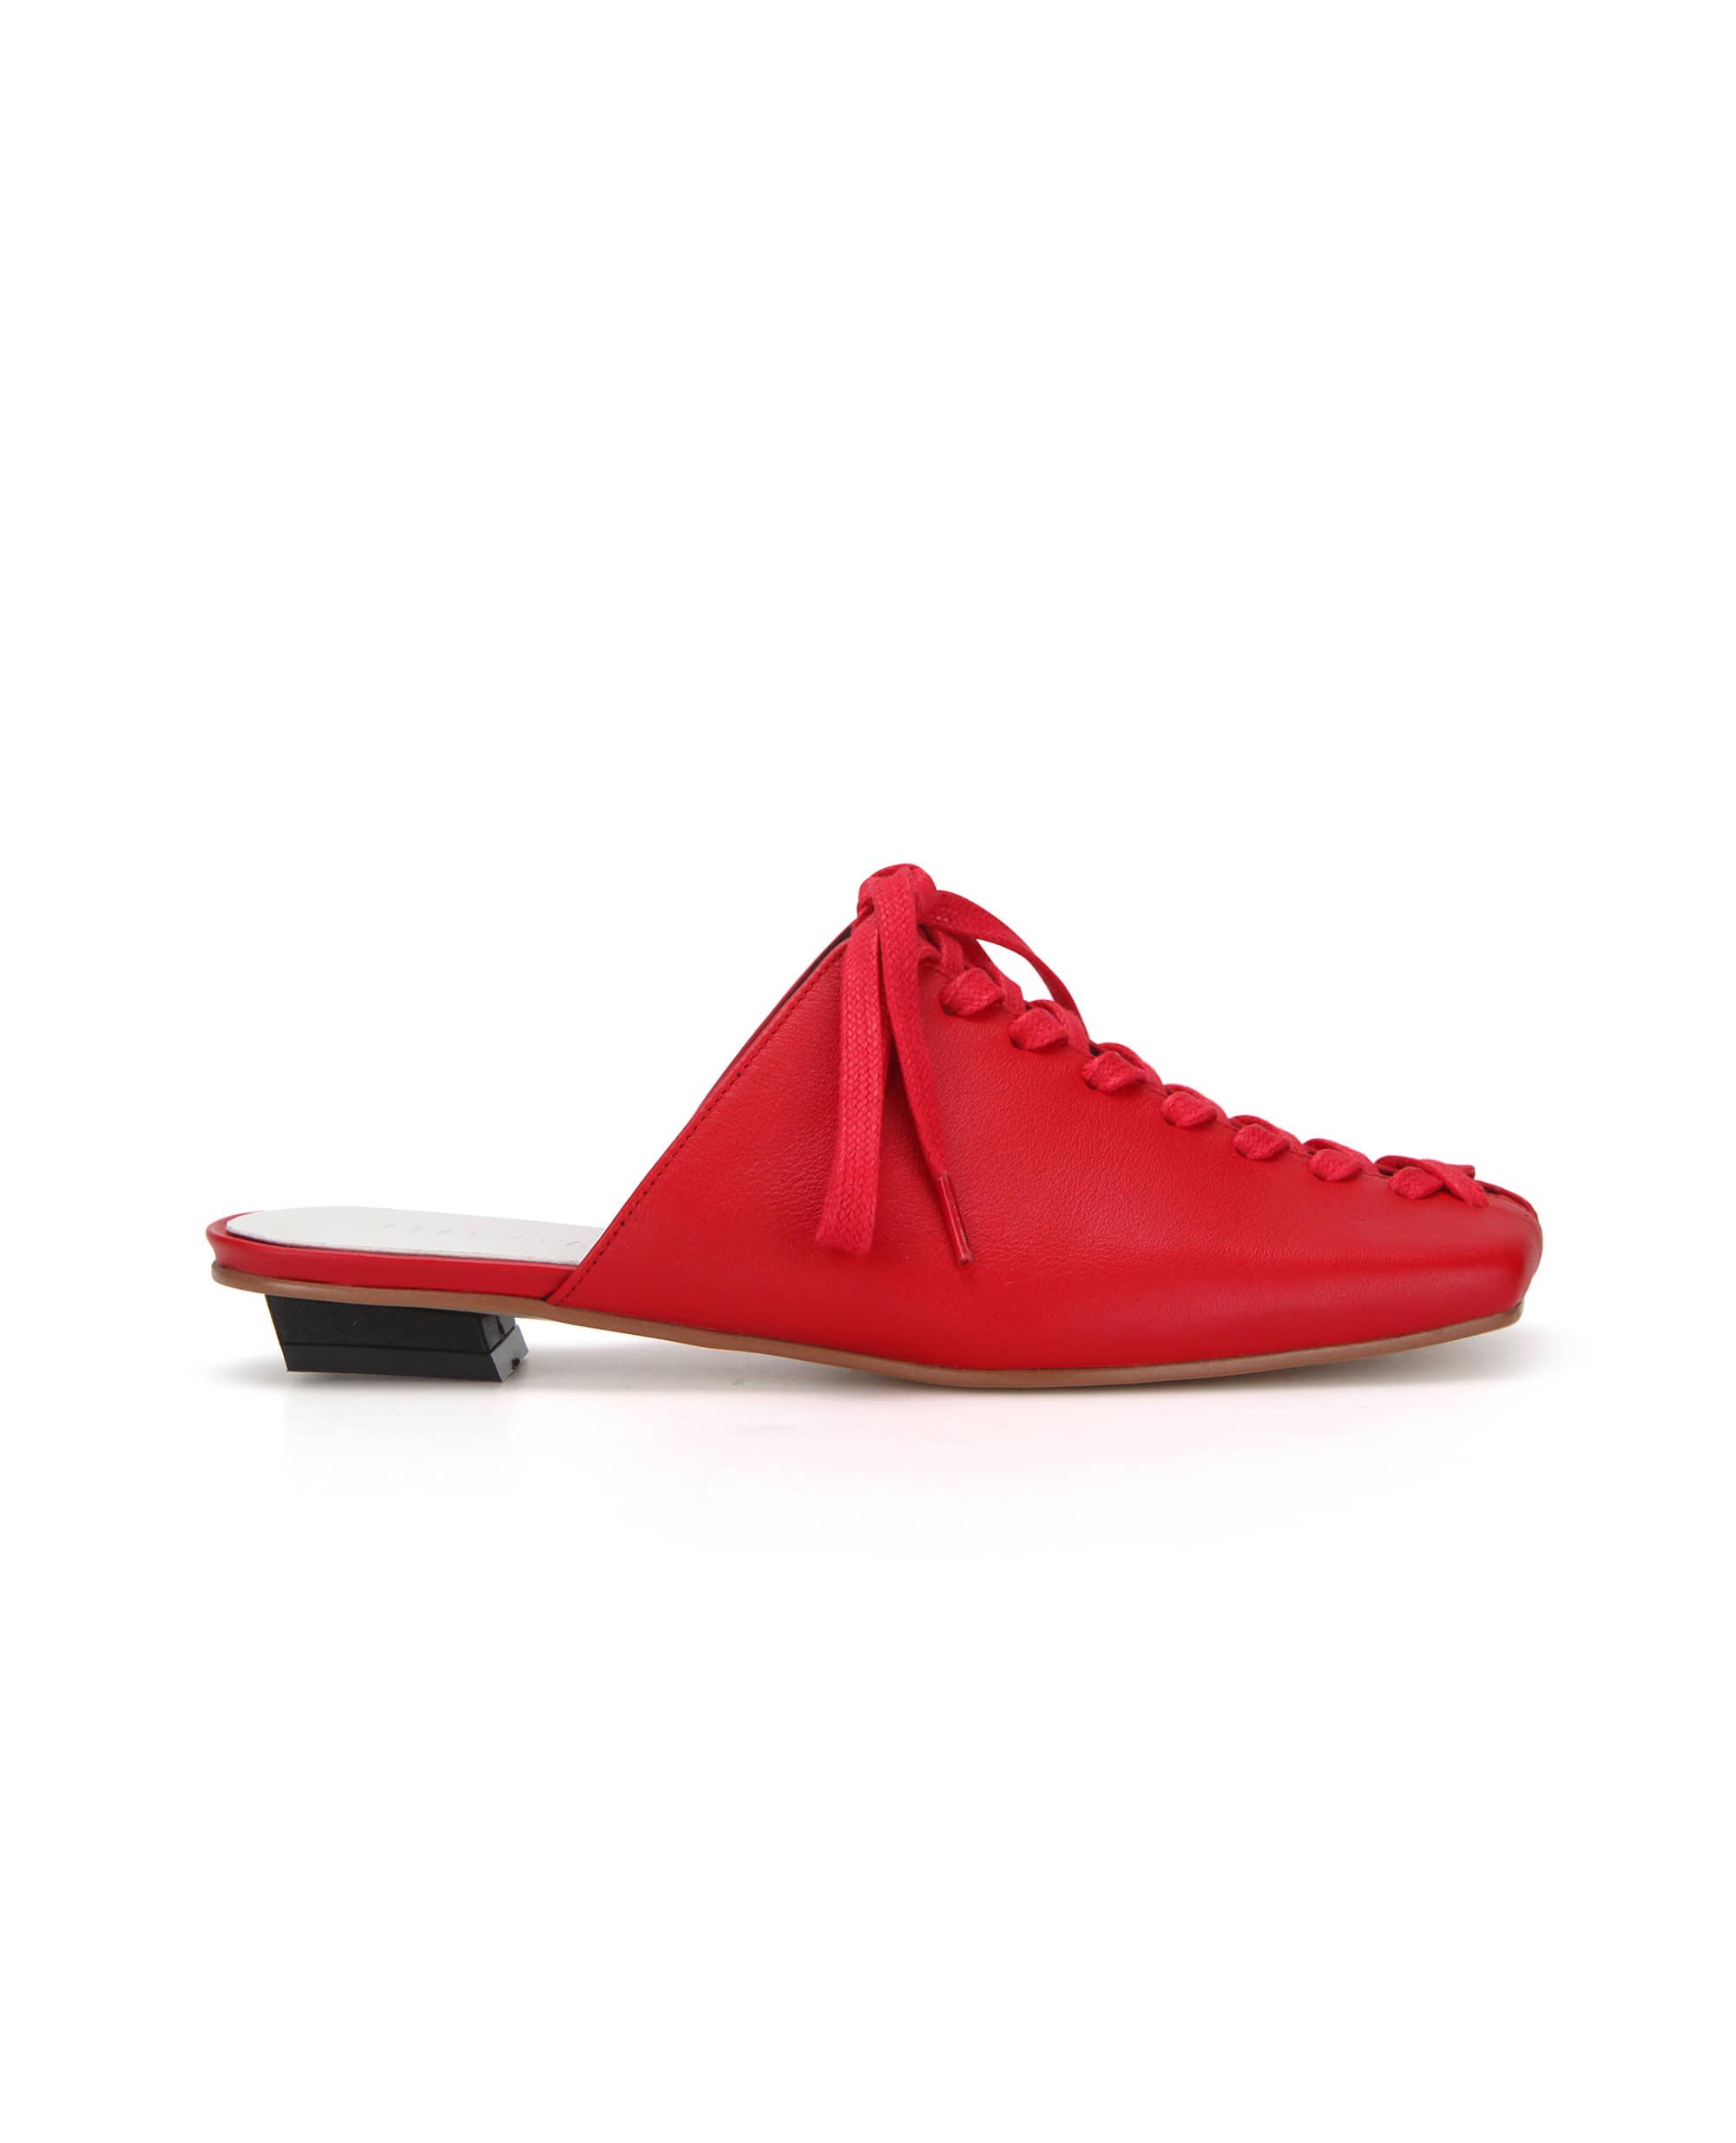 Flat apartment, flat shoes, flats, sabot, mules, flat apartment shoes, shoes, laceupshoes, 플랫아파트먼트, 플랫슈즈, 사보, 뮬